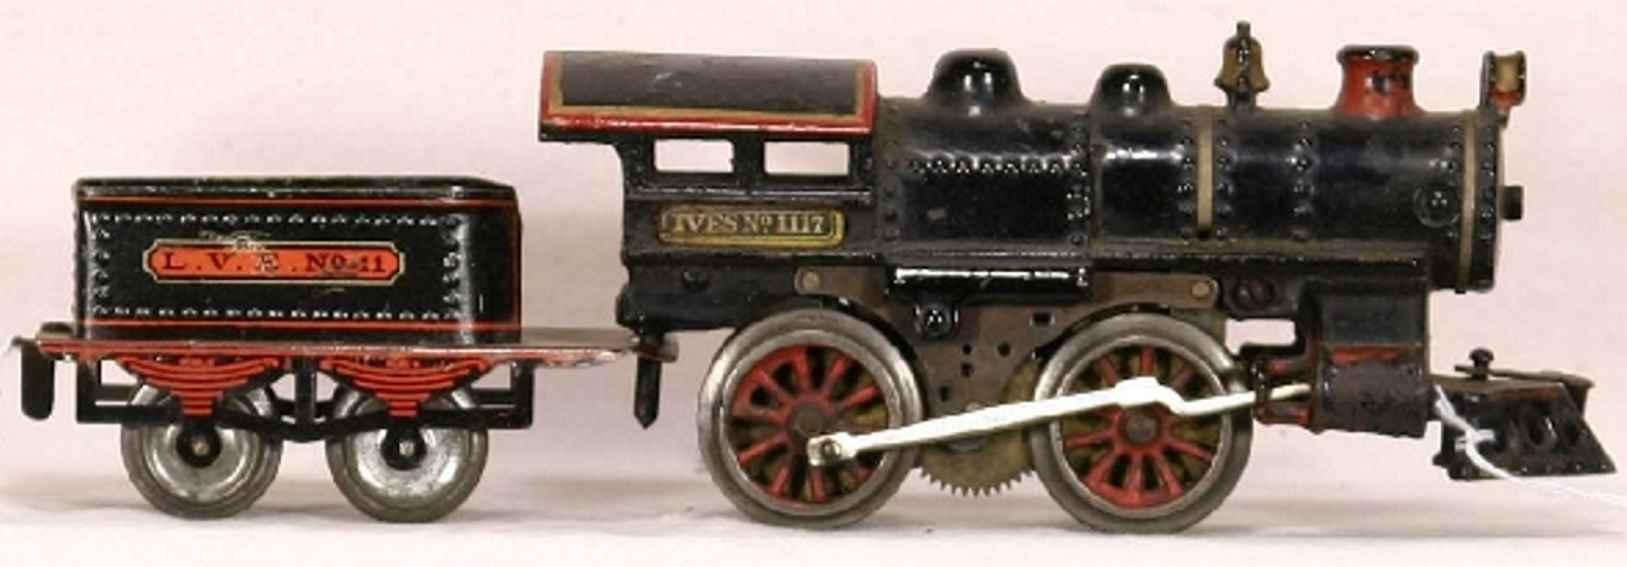 ives 1117 1912 pielzeug eisenbahn dampflokomotive spur 0